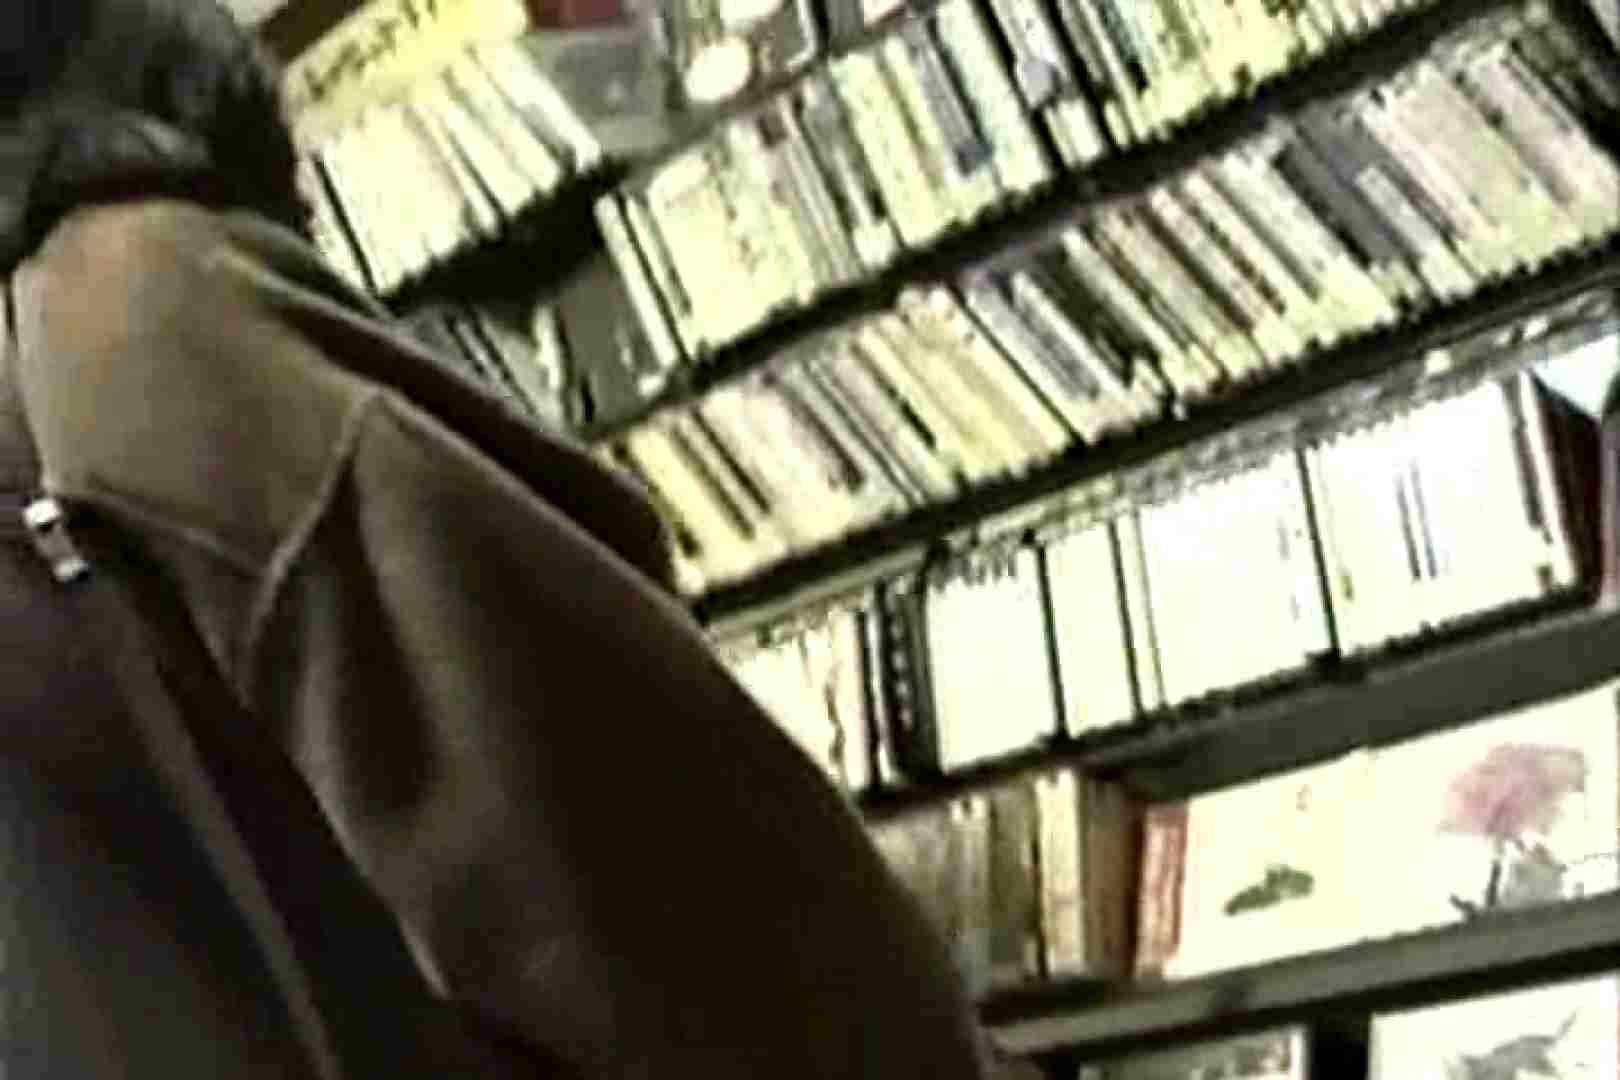 投稿盗撮 女子の下着の考察TK-043 盗撮特集 女性器鑑賞 68画像 3